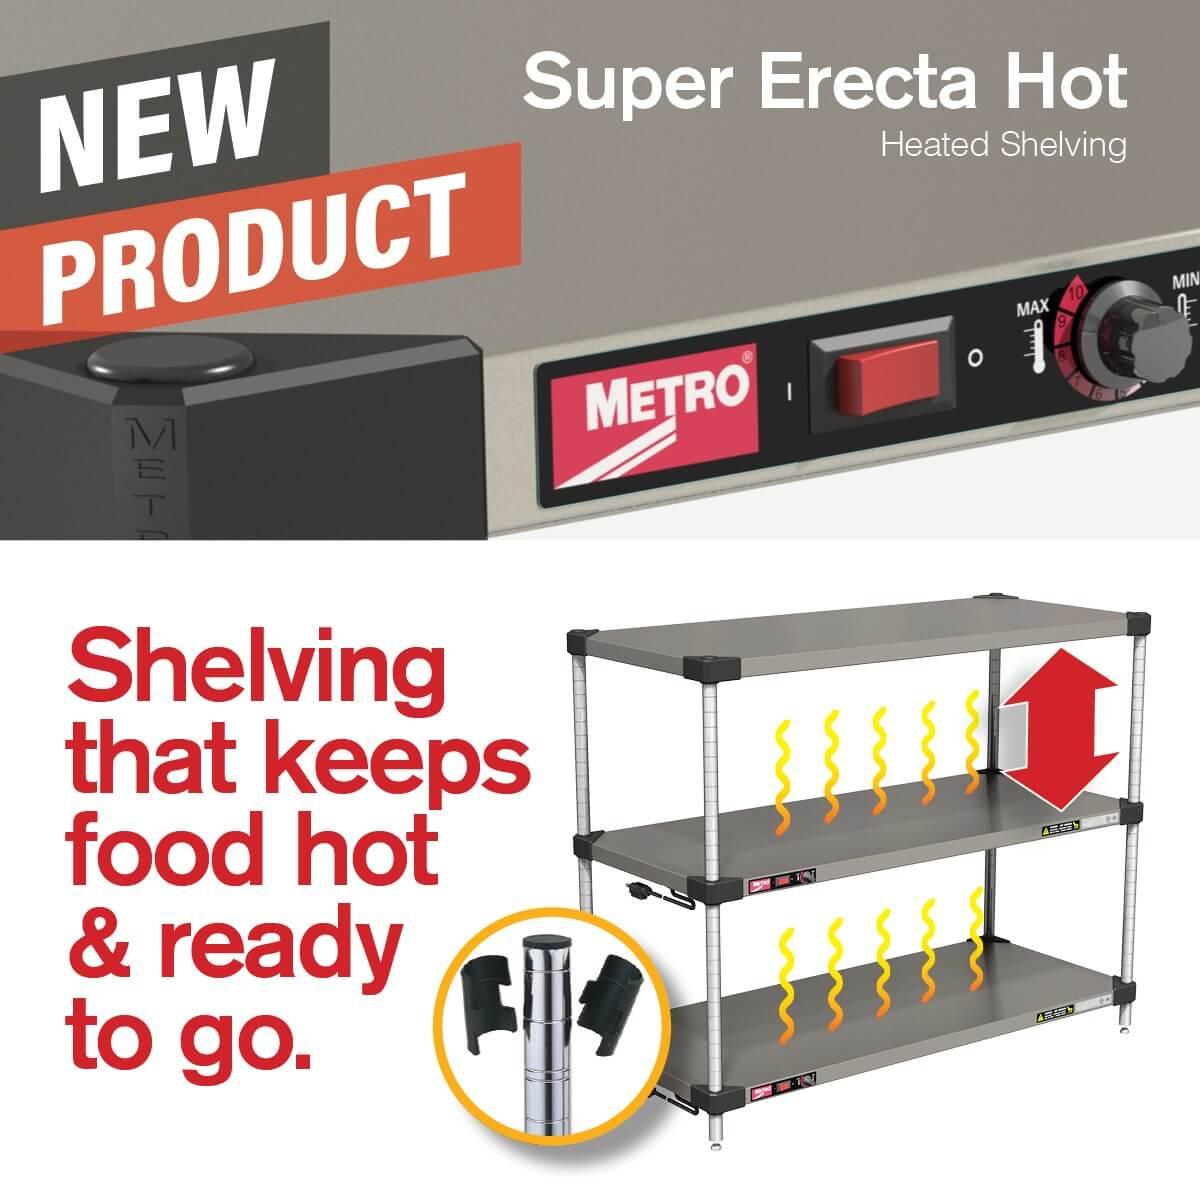 Metro's Super Erecta Hot Shelving